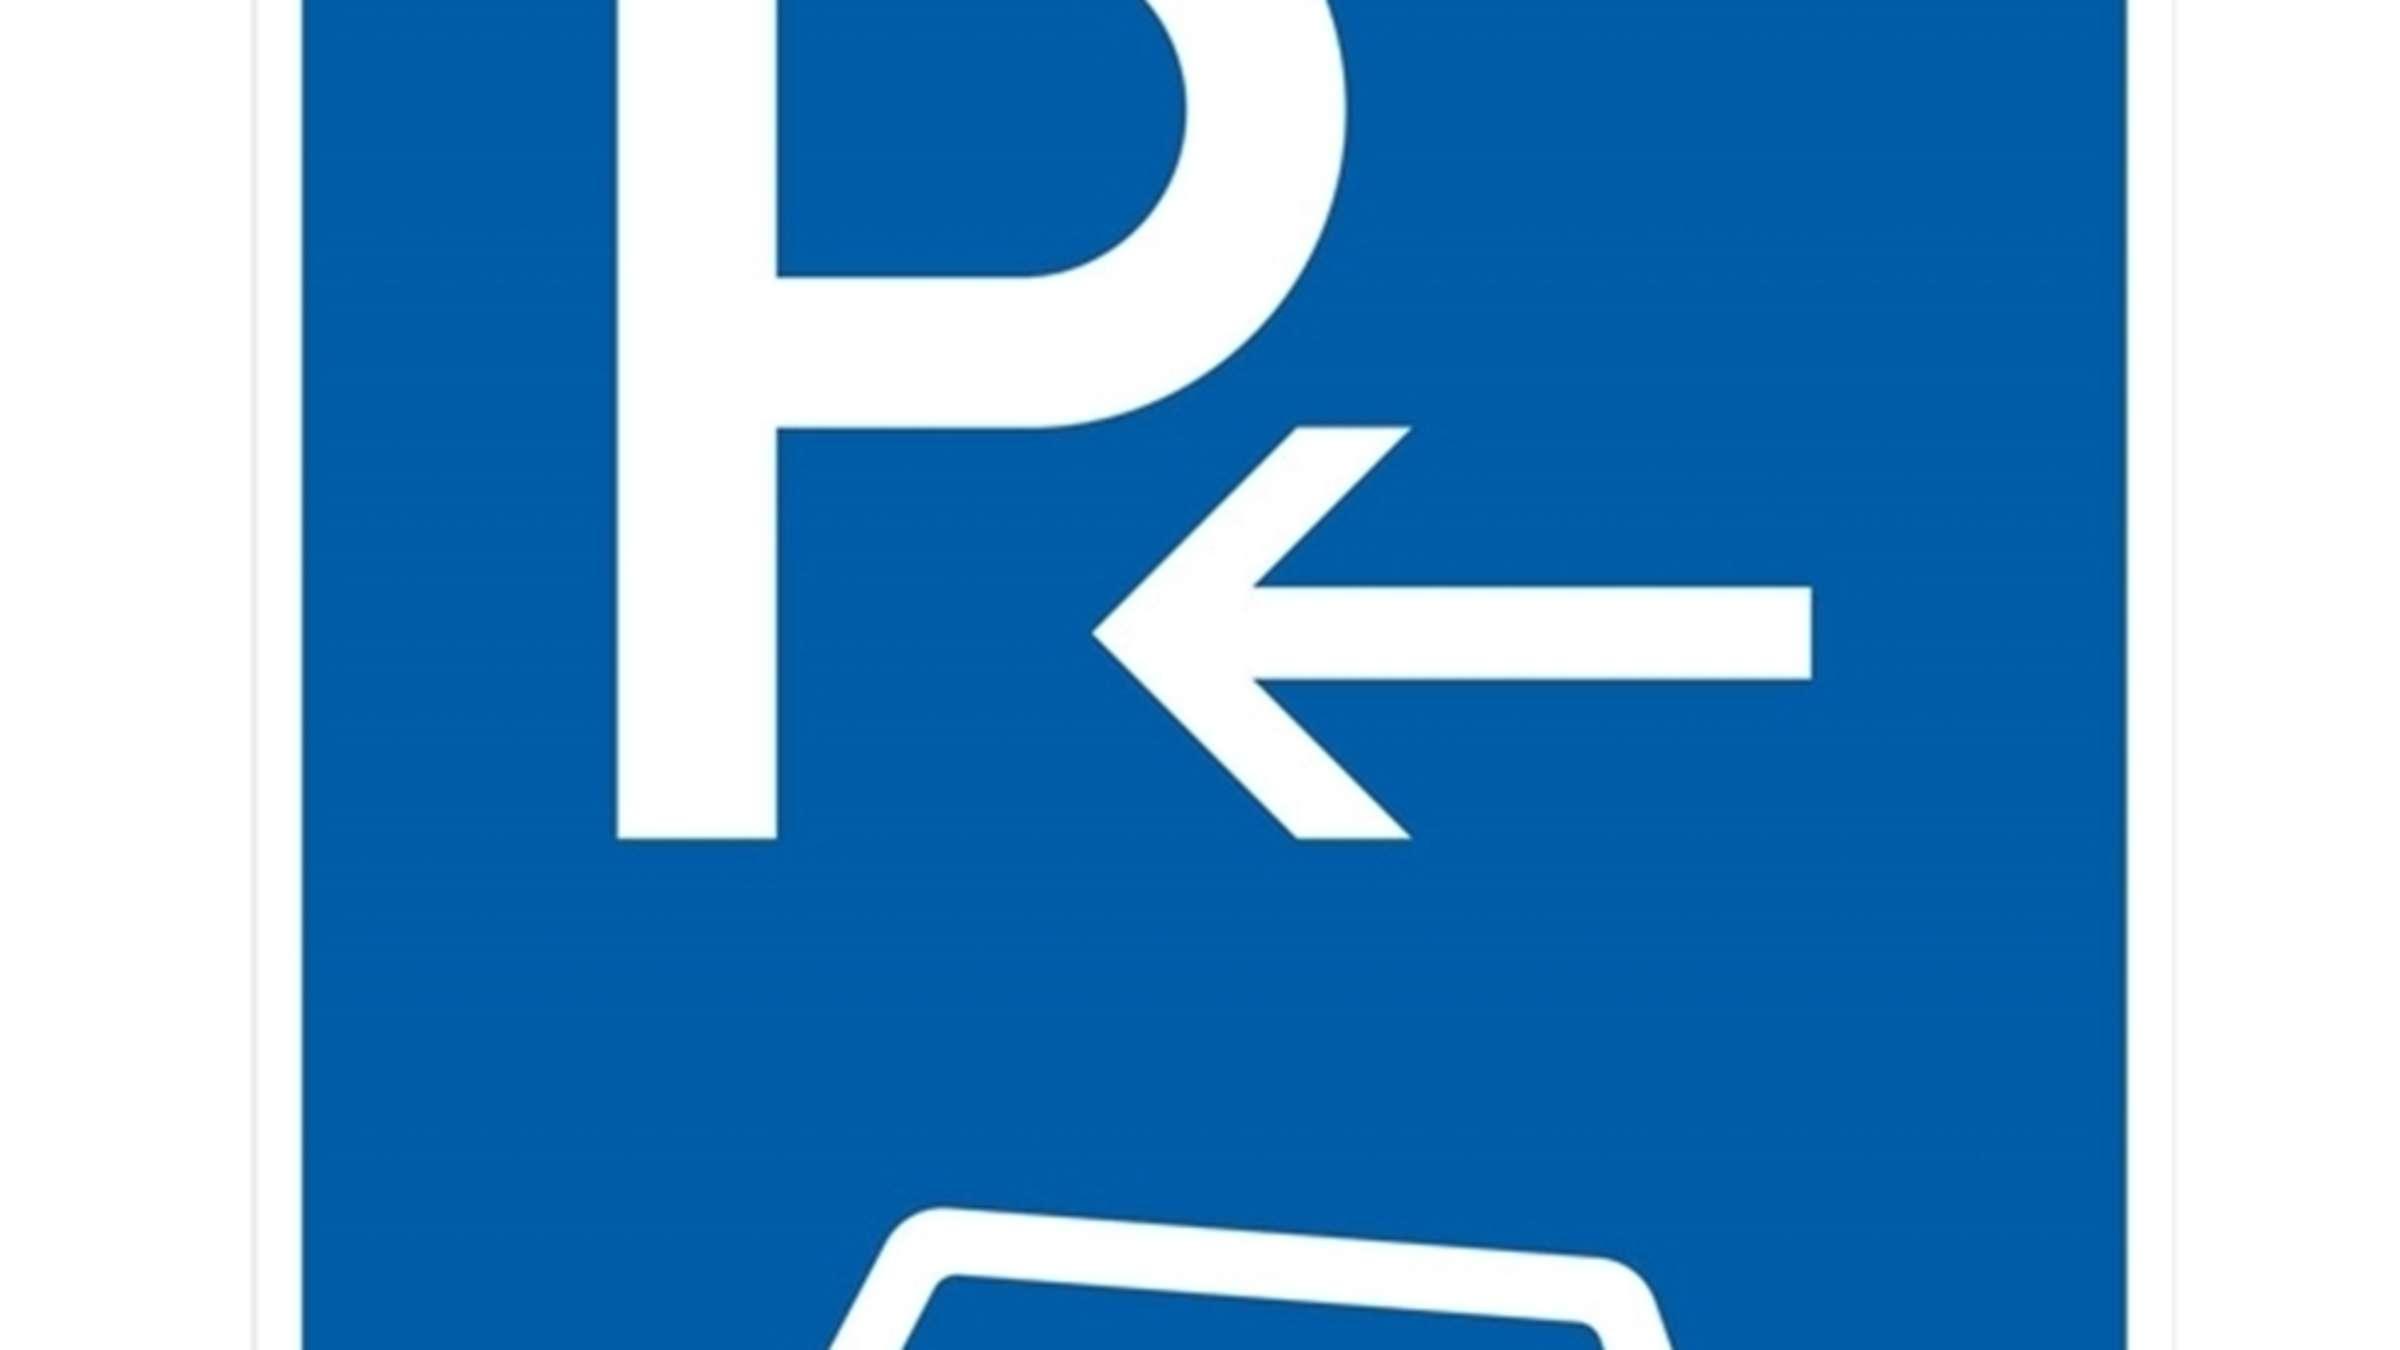 parken außerhalb geschlossener ortschaften